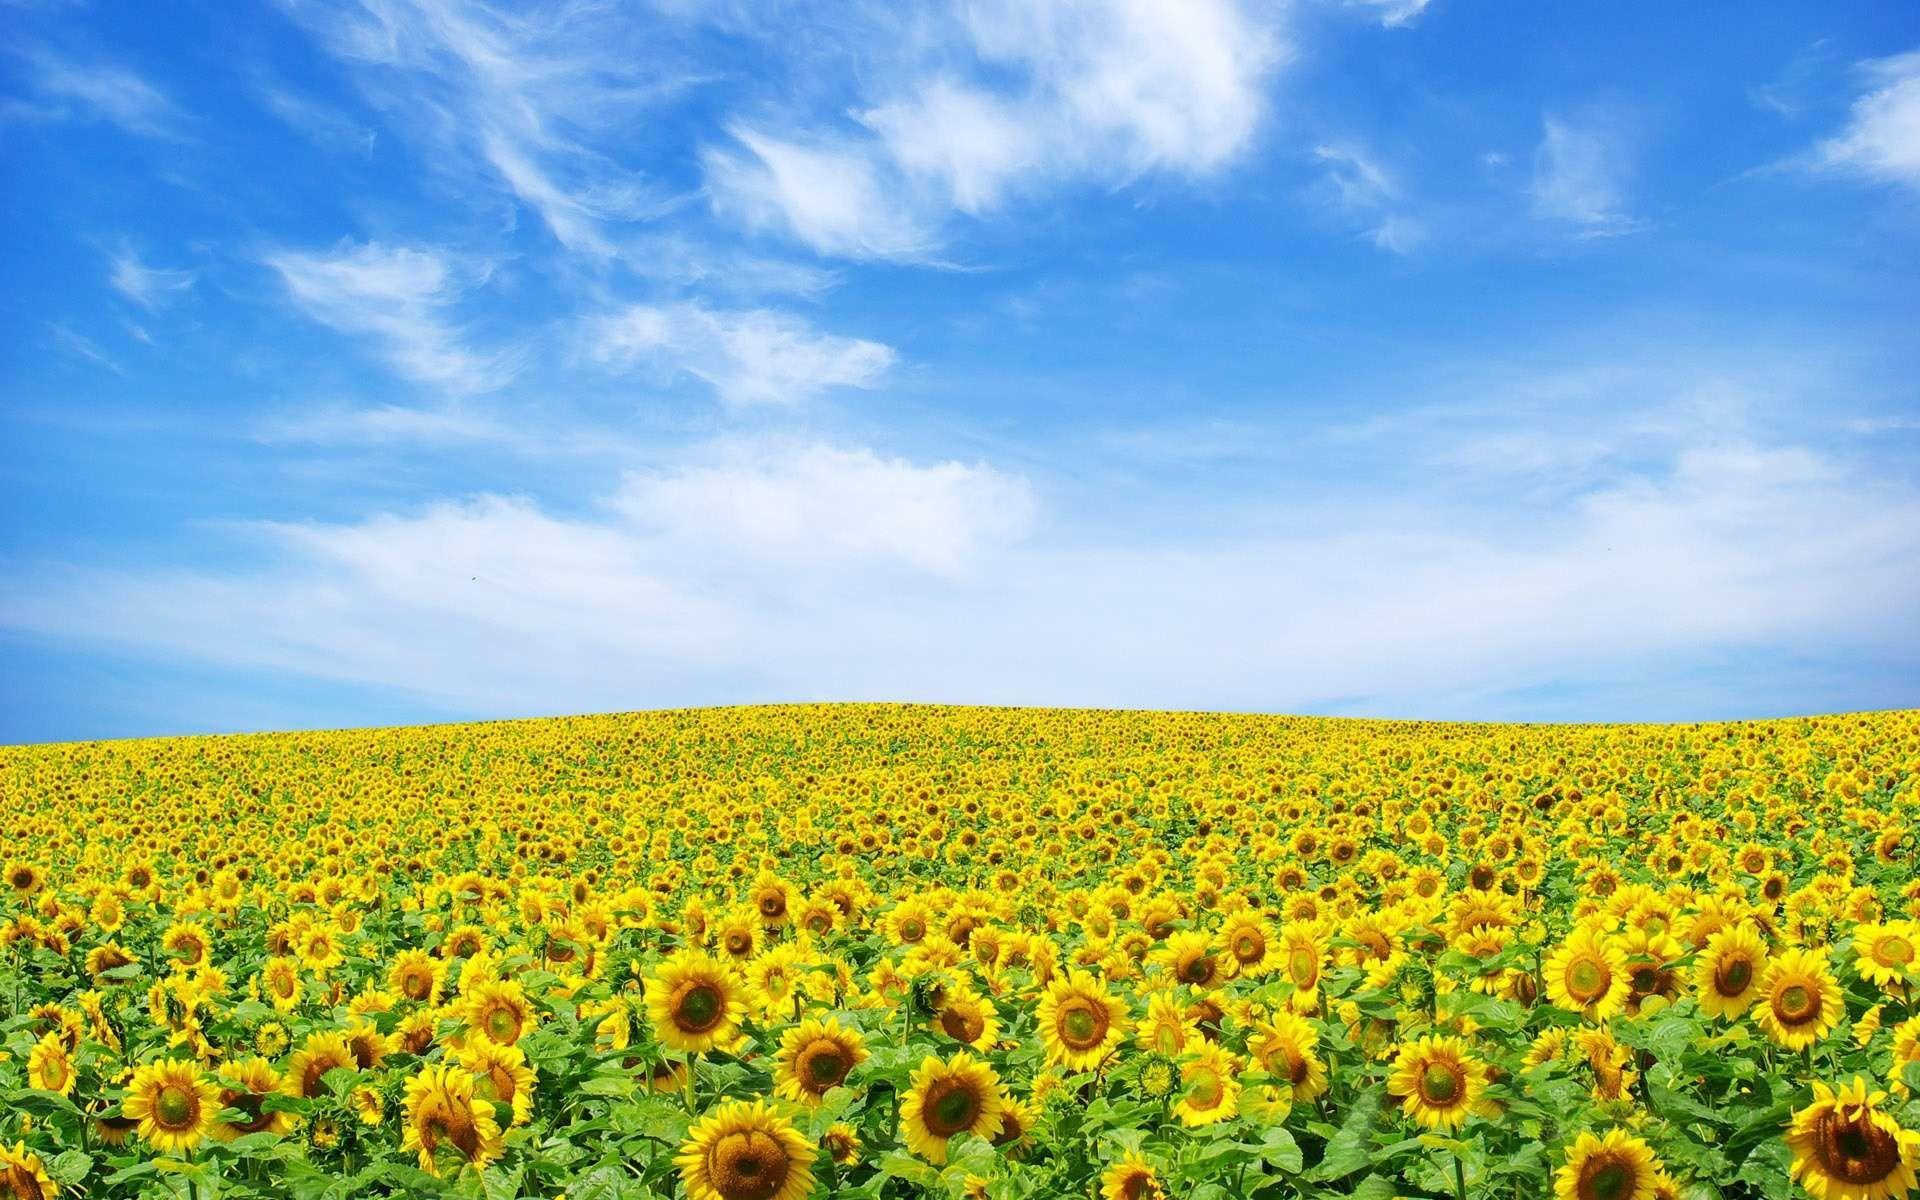 Wallpaper: Sunflower Landscape HD Wallpaper 1080p. Upload at March 31 .